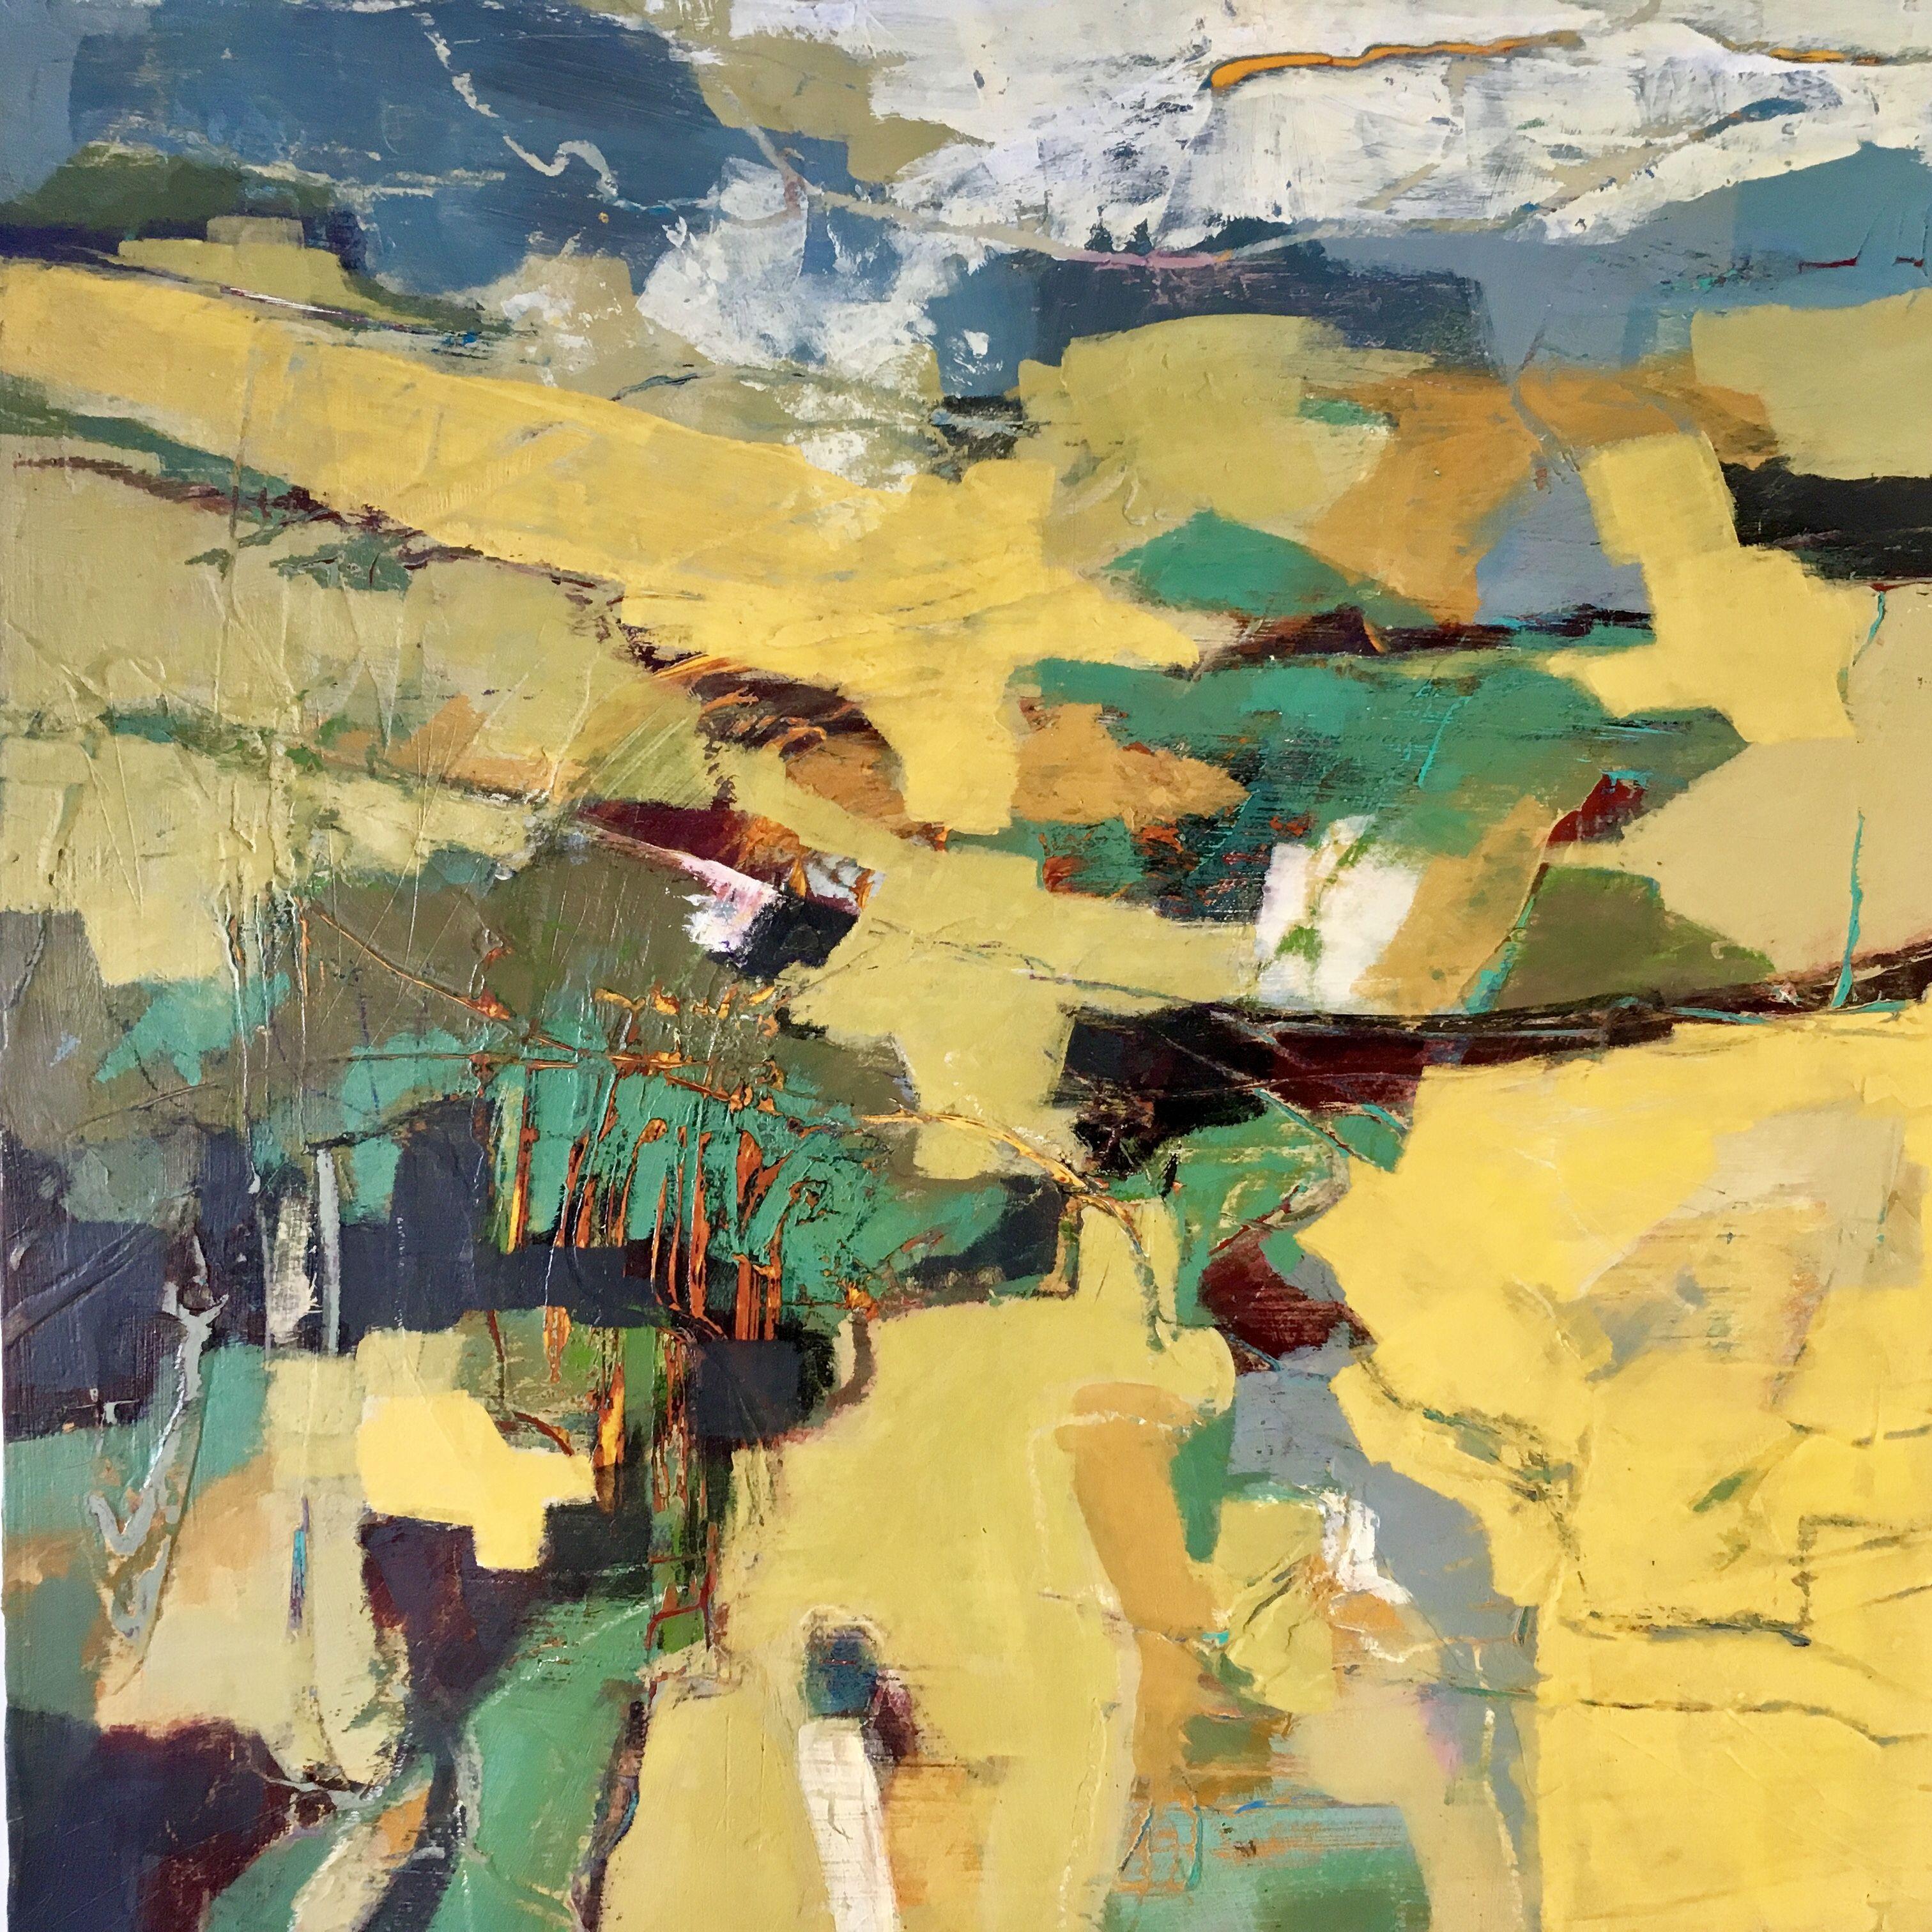 Pin By Liz Van Zeeland On More Art Abstract Art Landscape Abstract Art Painting Abstract Landscape Painting